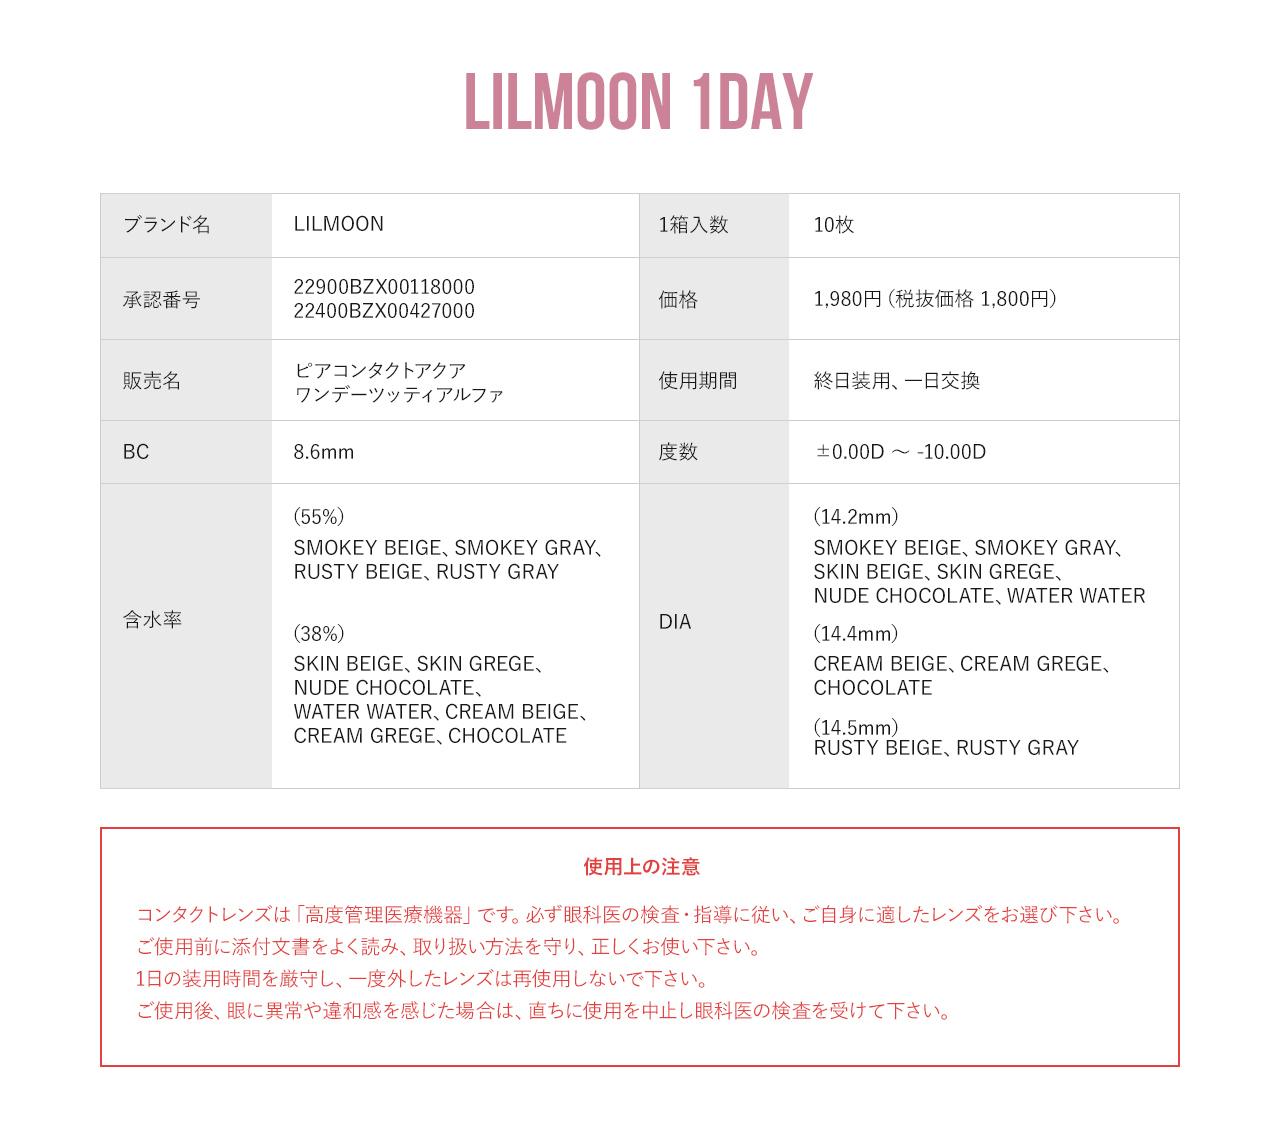 LILMOON14